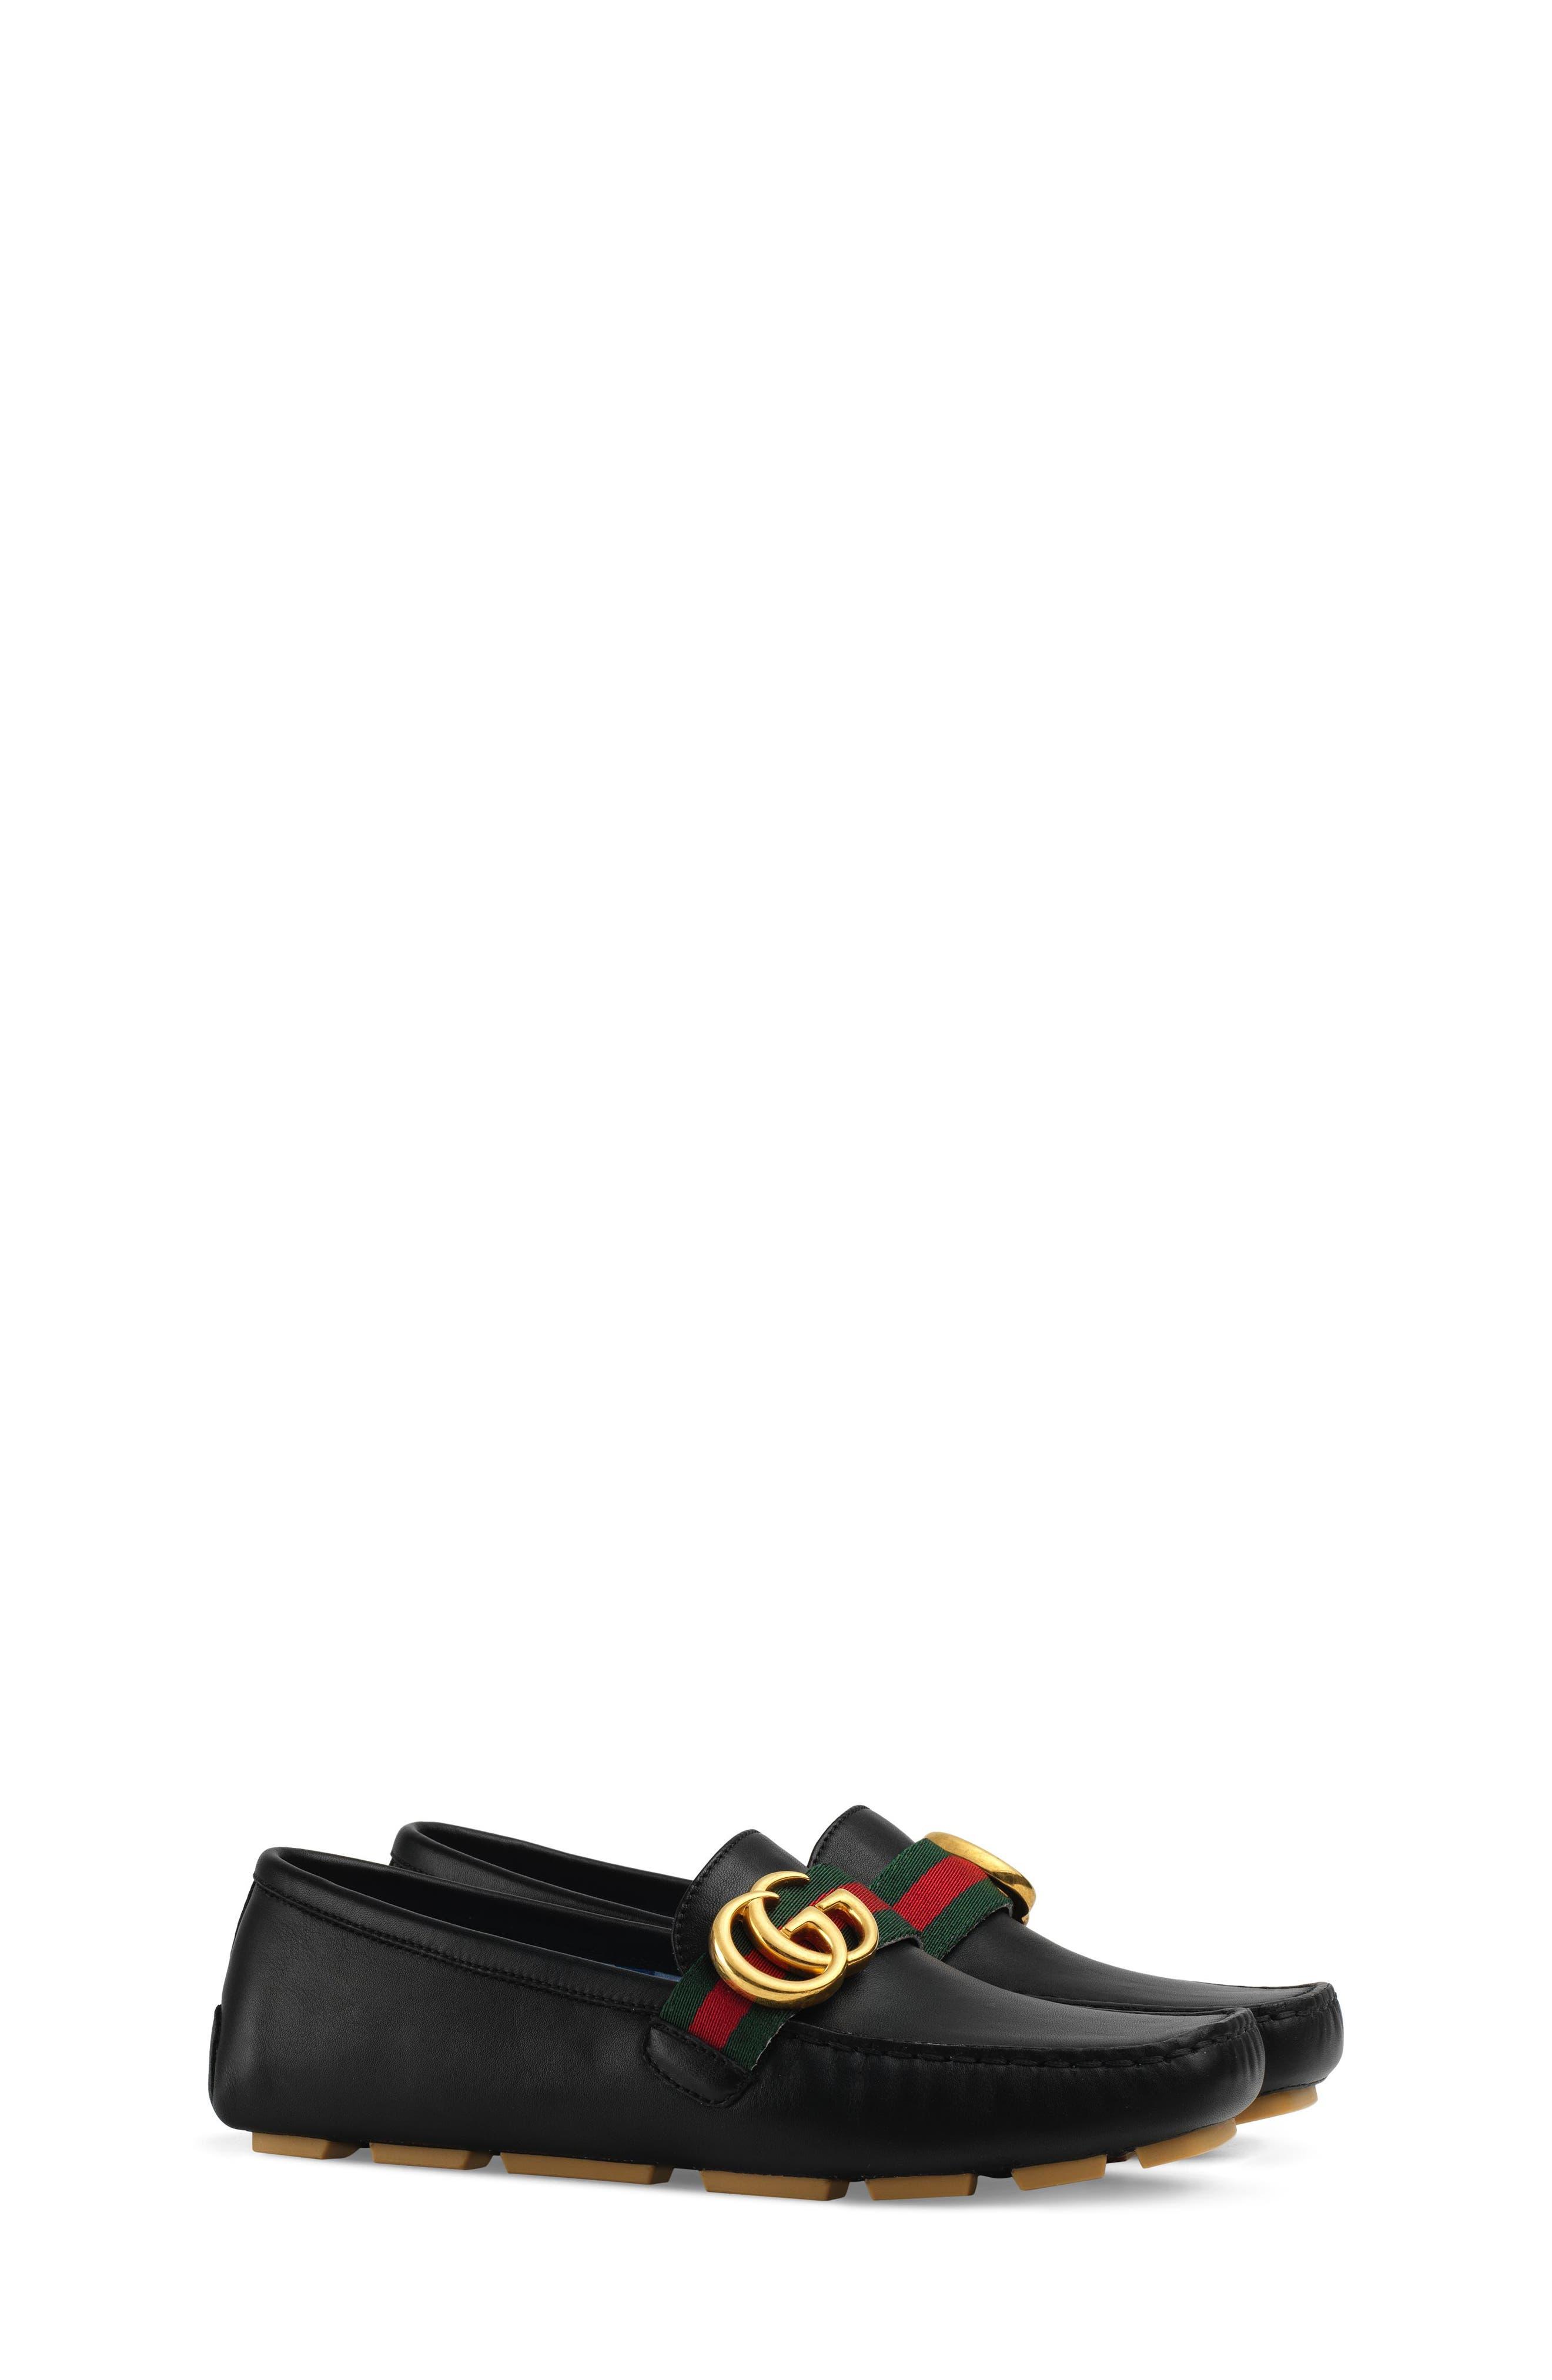 GUCCI Noel Driving Loafer, Main, color, BLACK